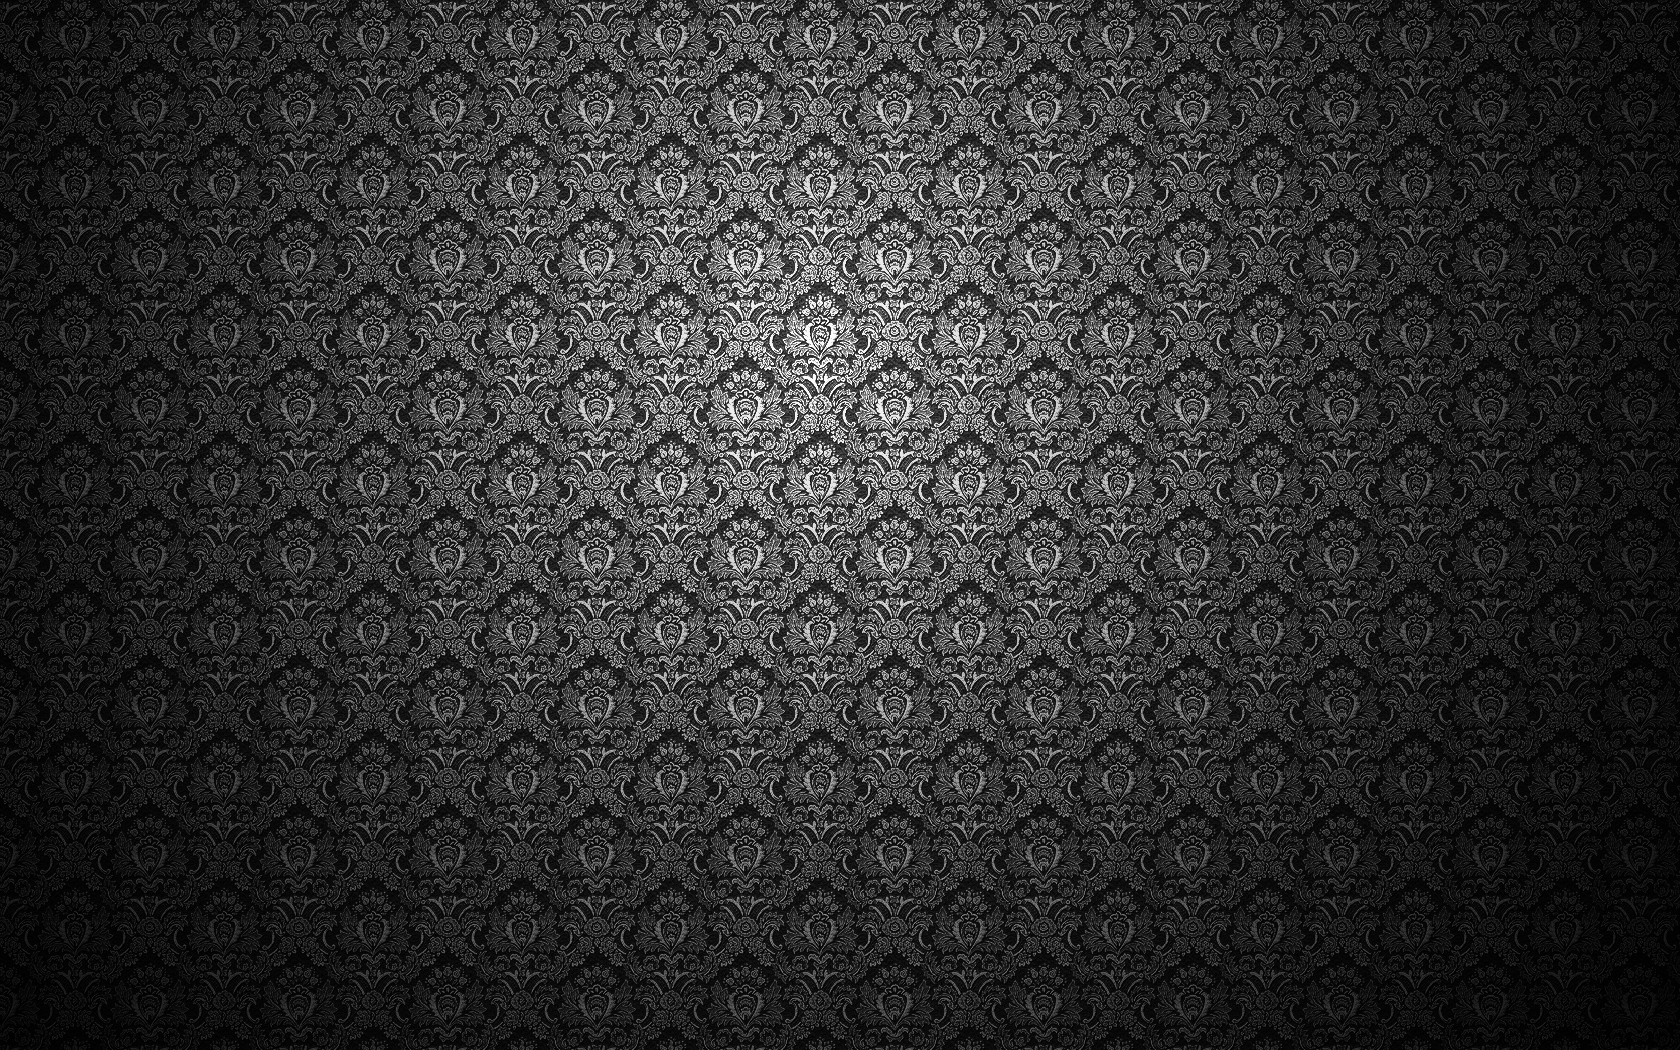 Imperial Dark By Monkeymagico On Deviantart